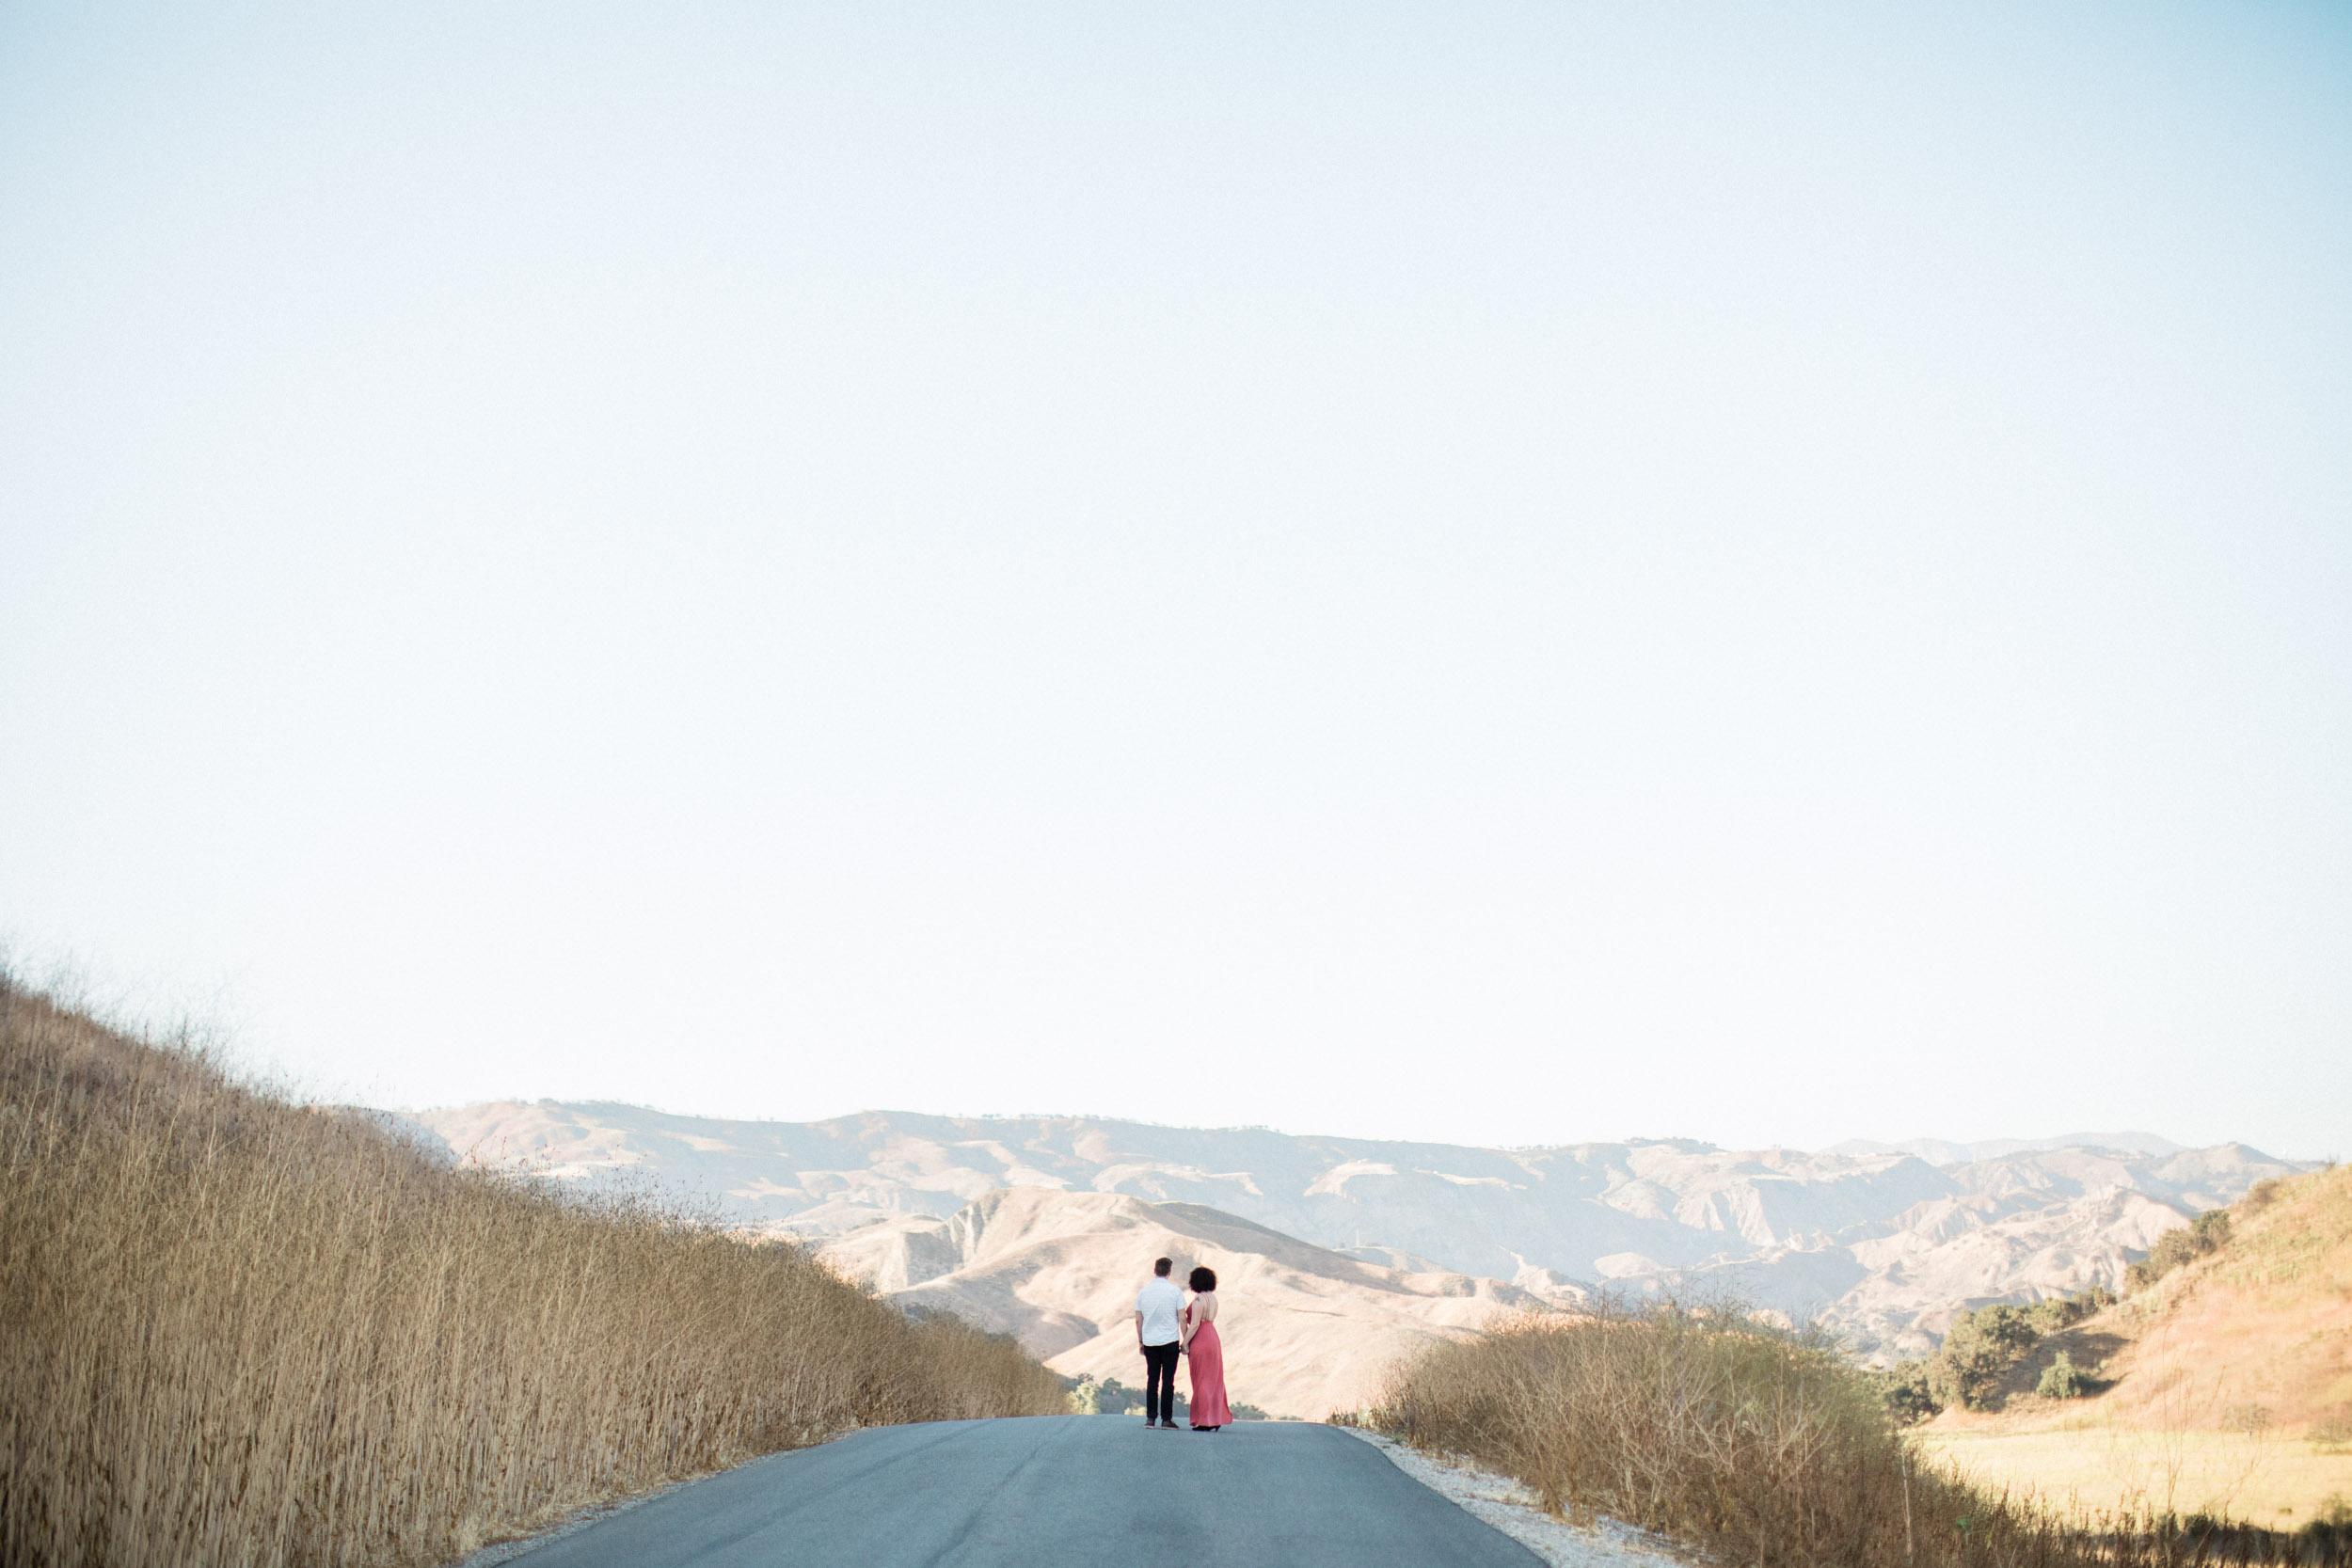 BKM-Photography-Ventura-Southern-California-Engagement-Wedding-0007.jpg